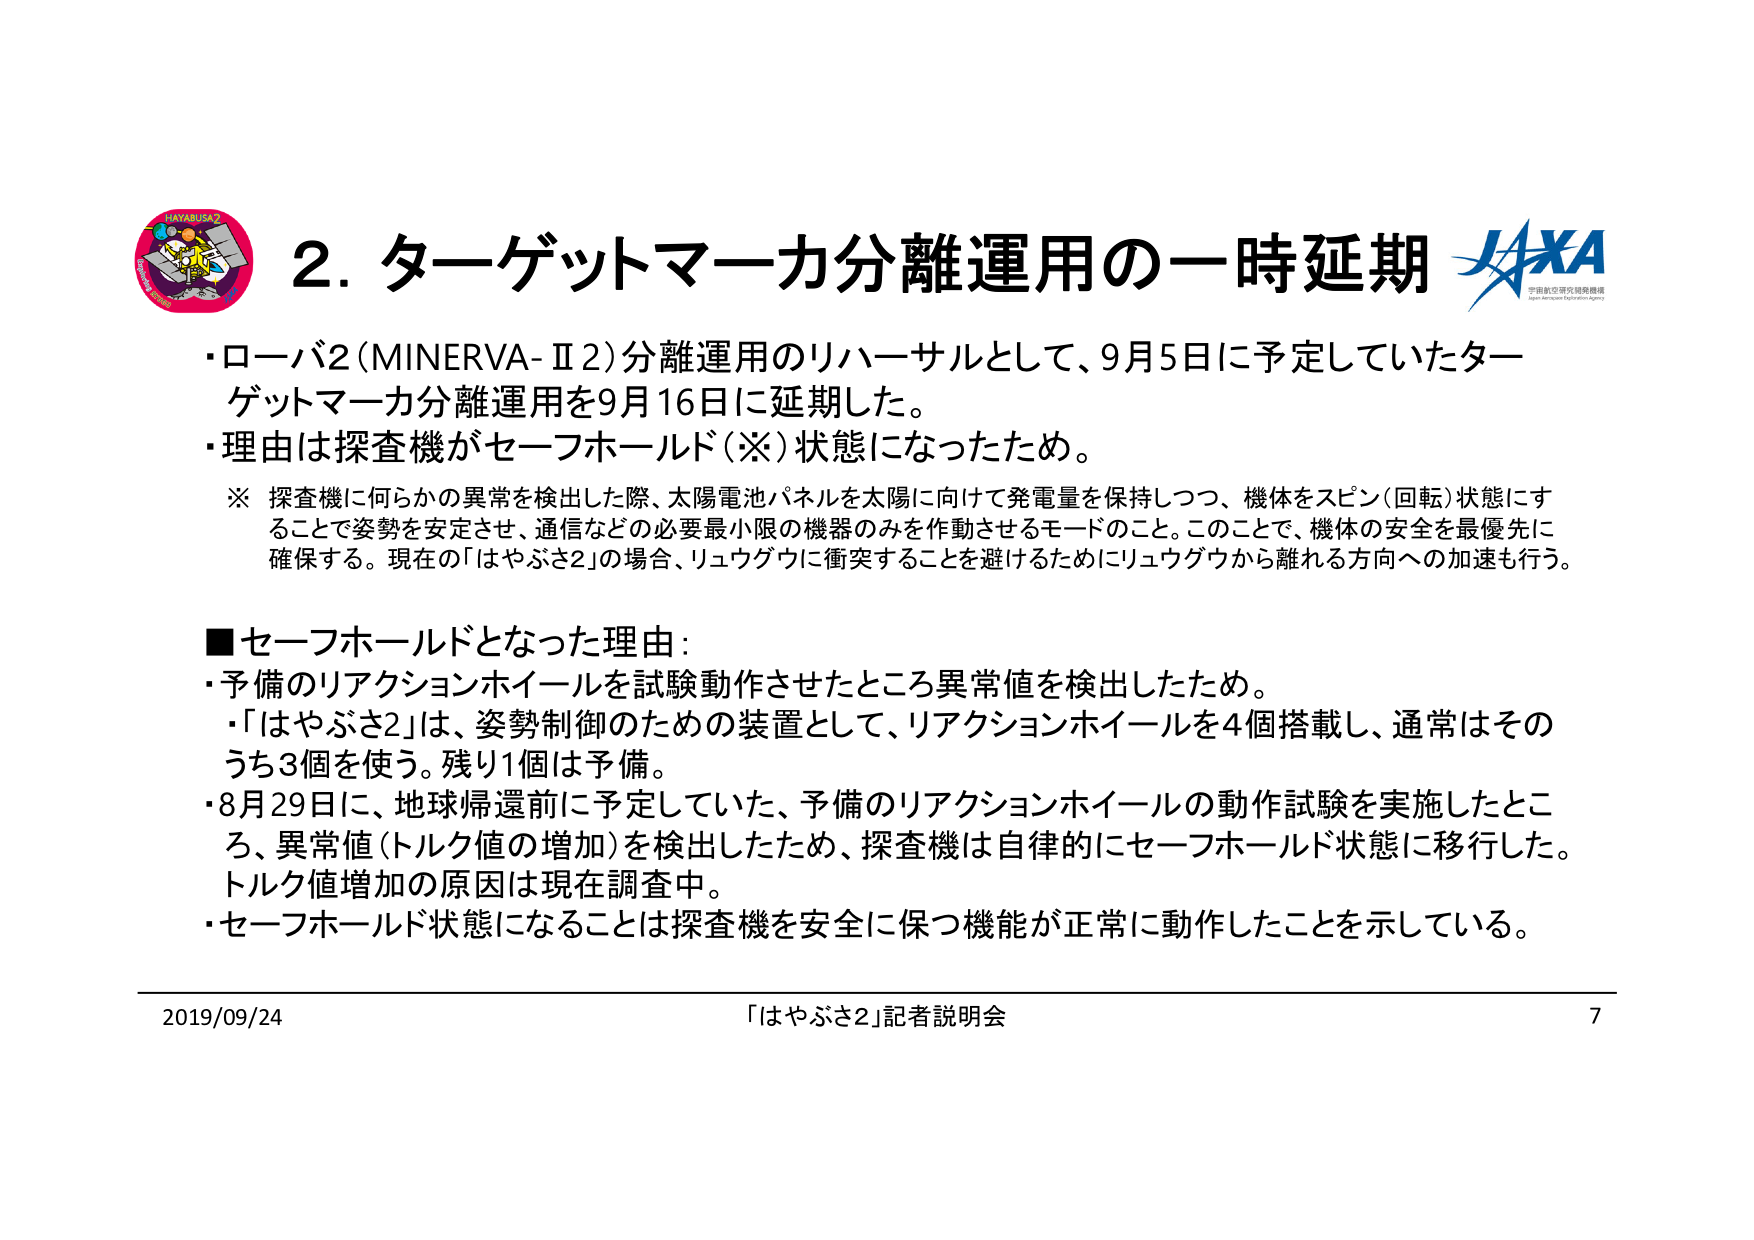 f:id:Imamura:20190924122509p:plain